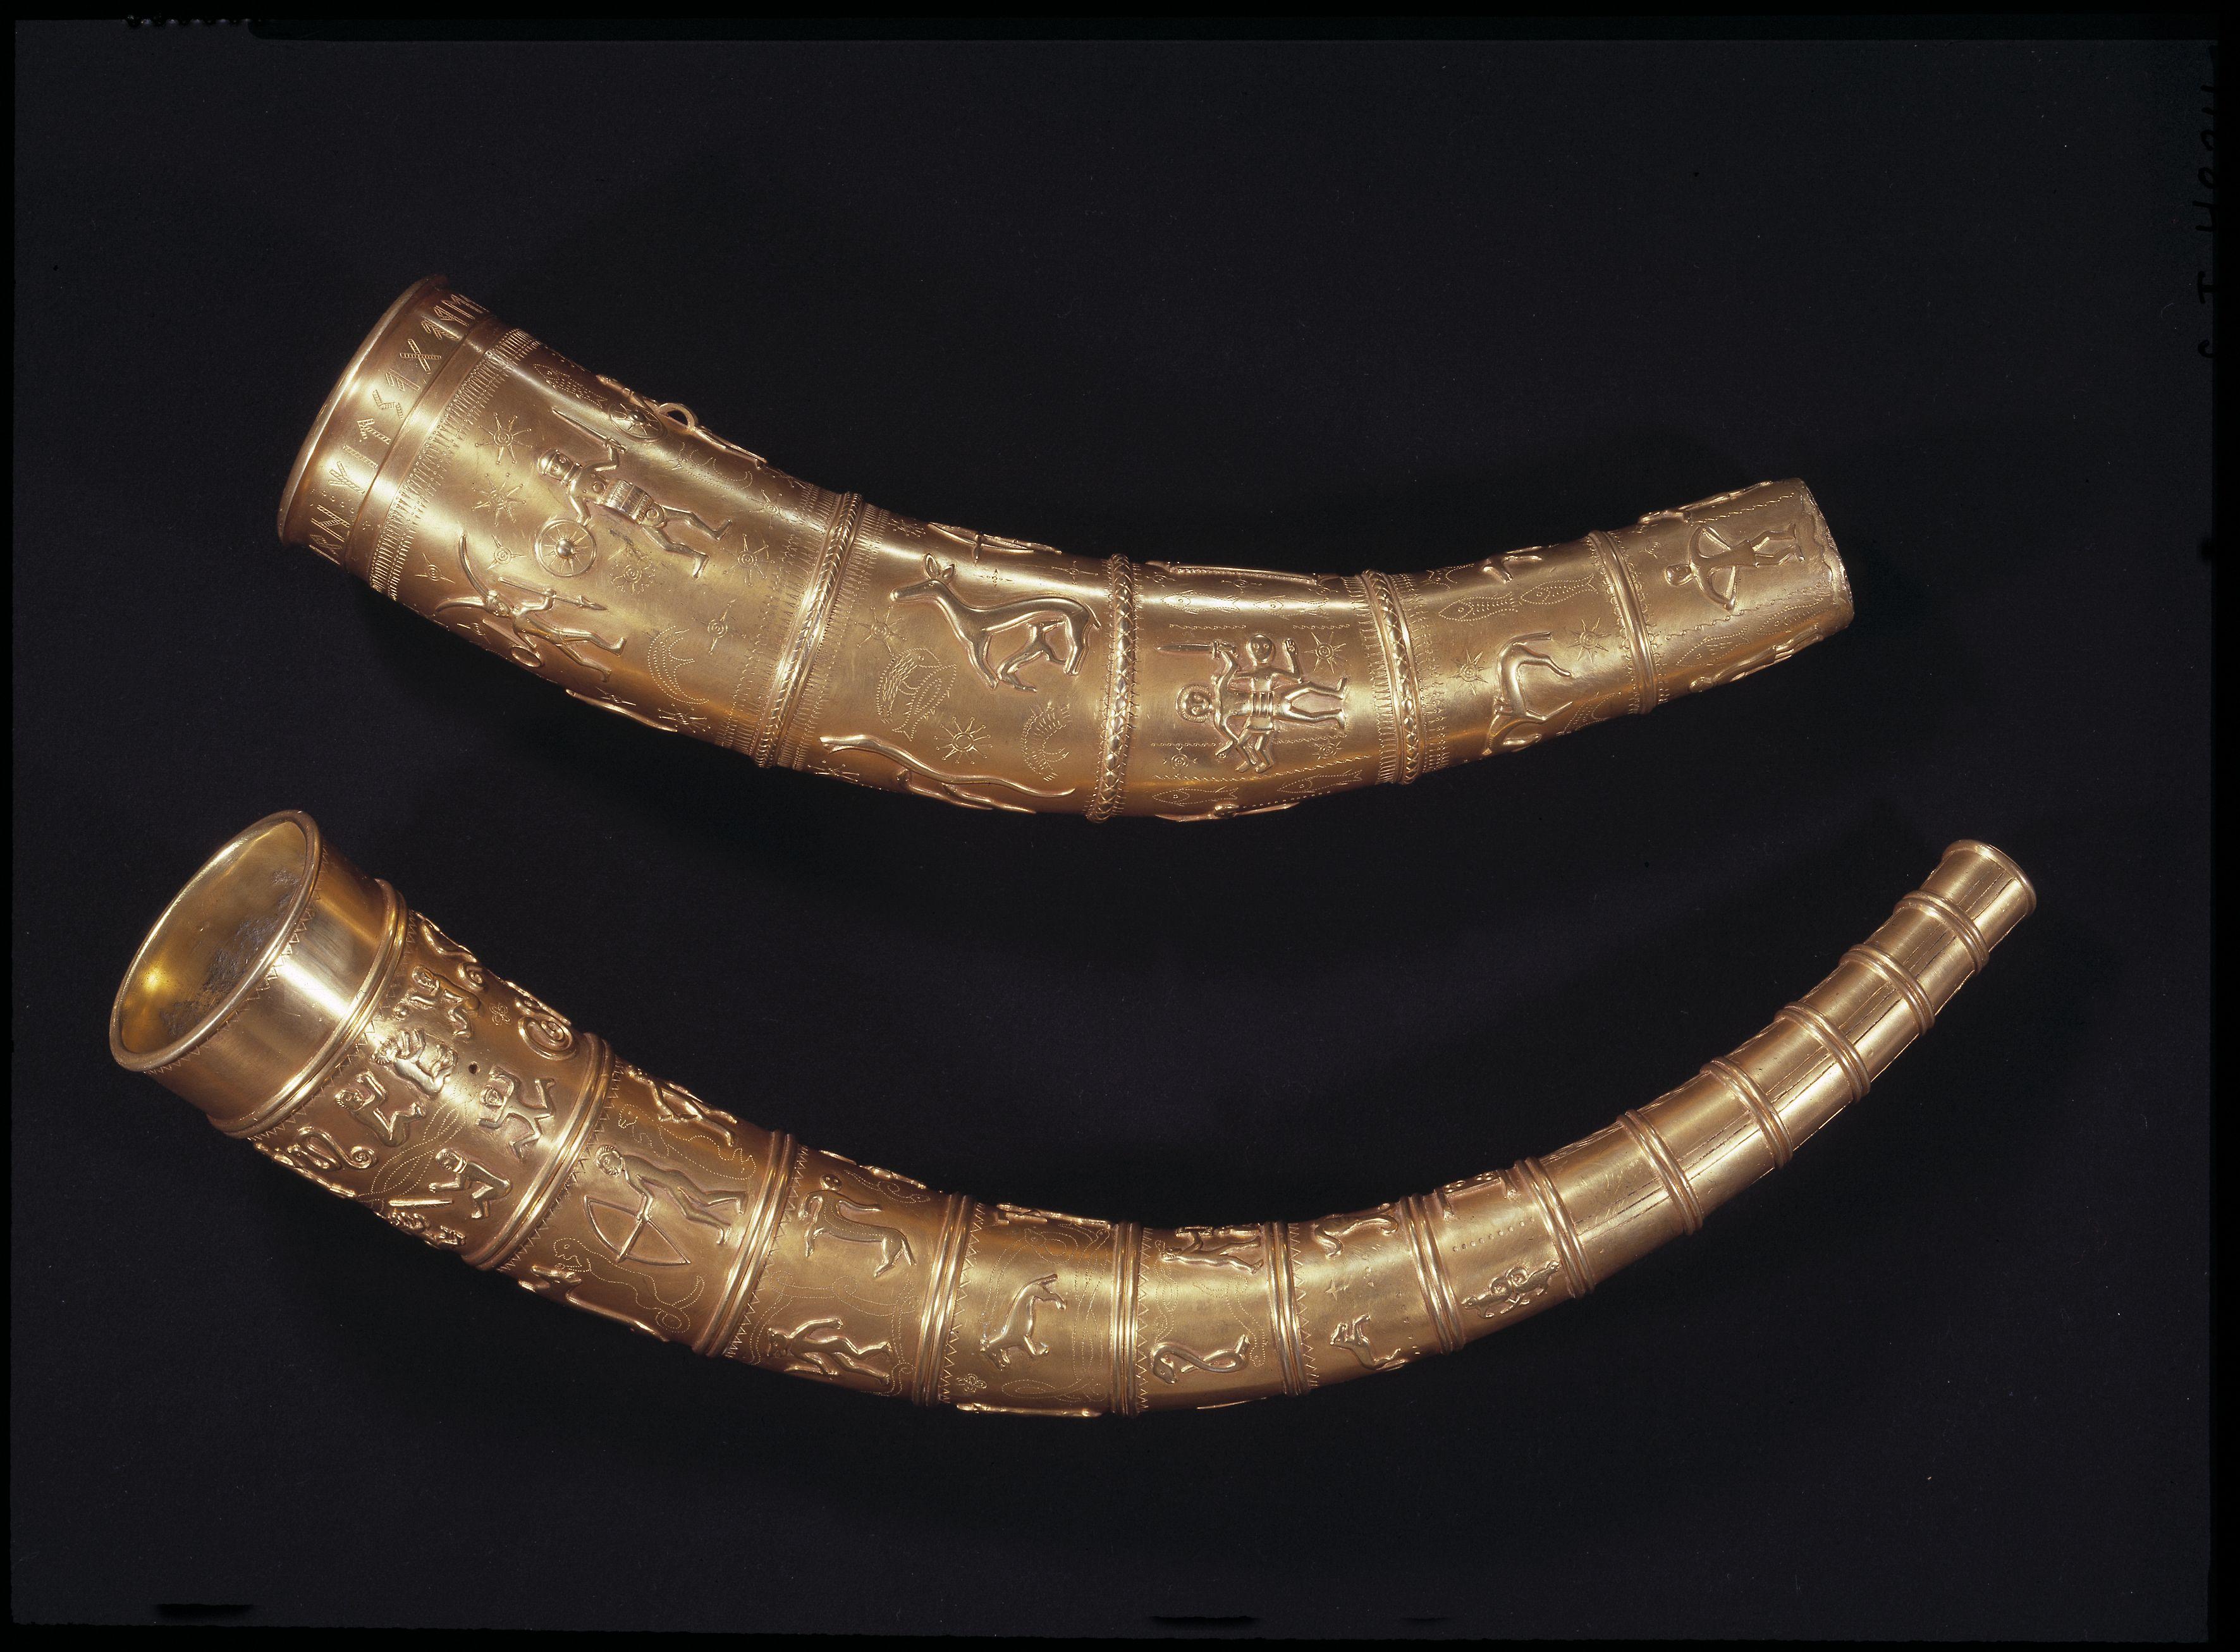 Gallehus horns